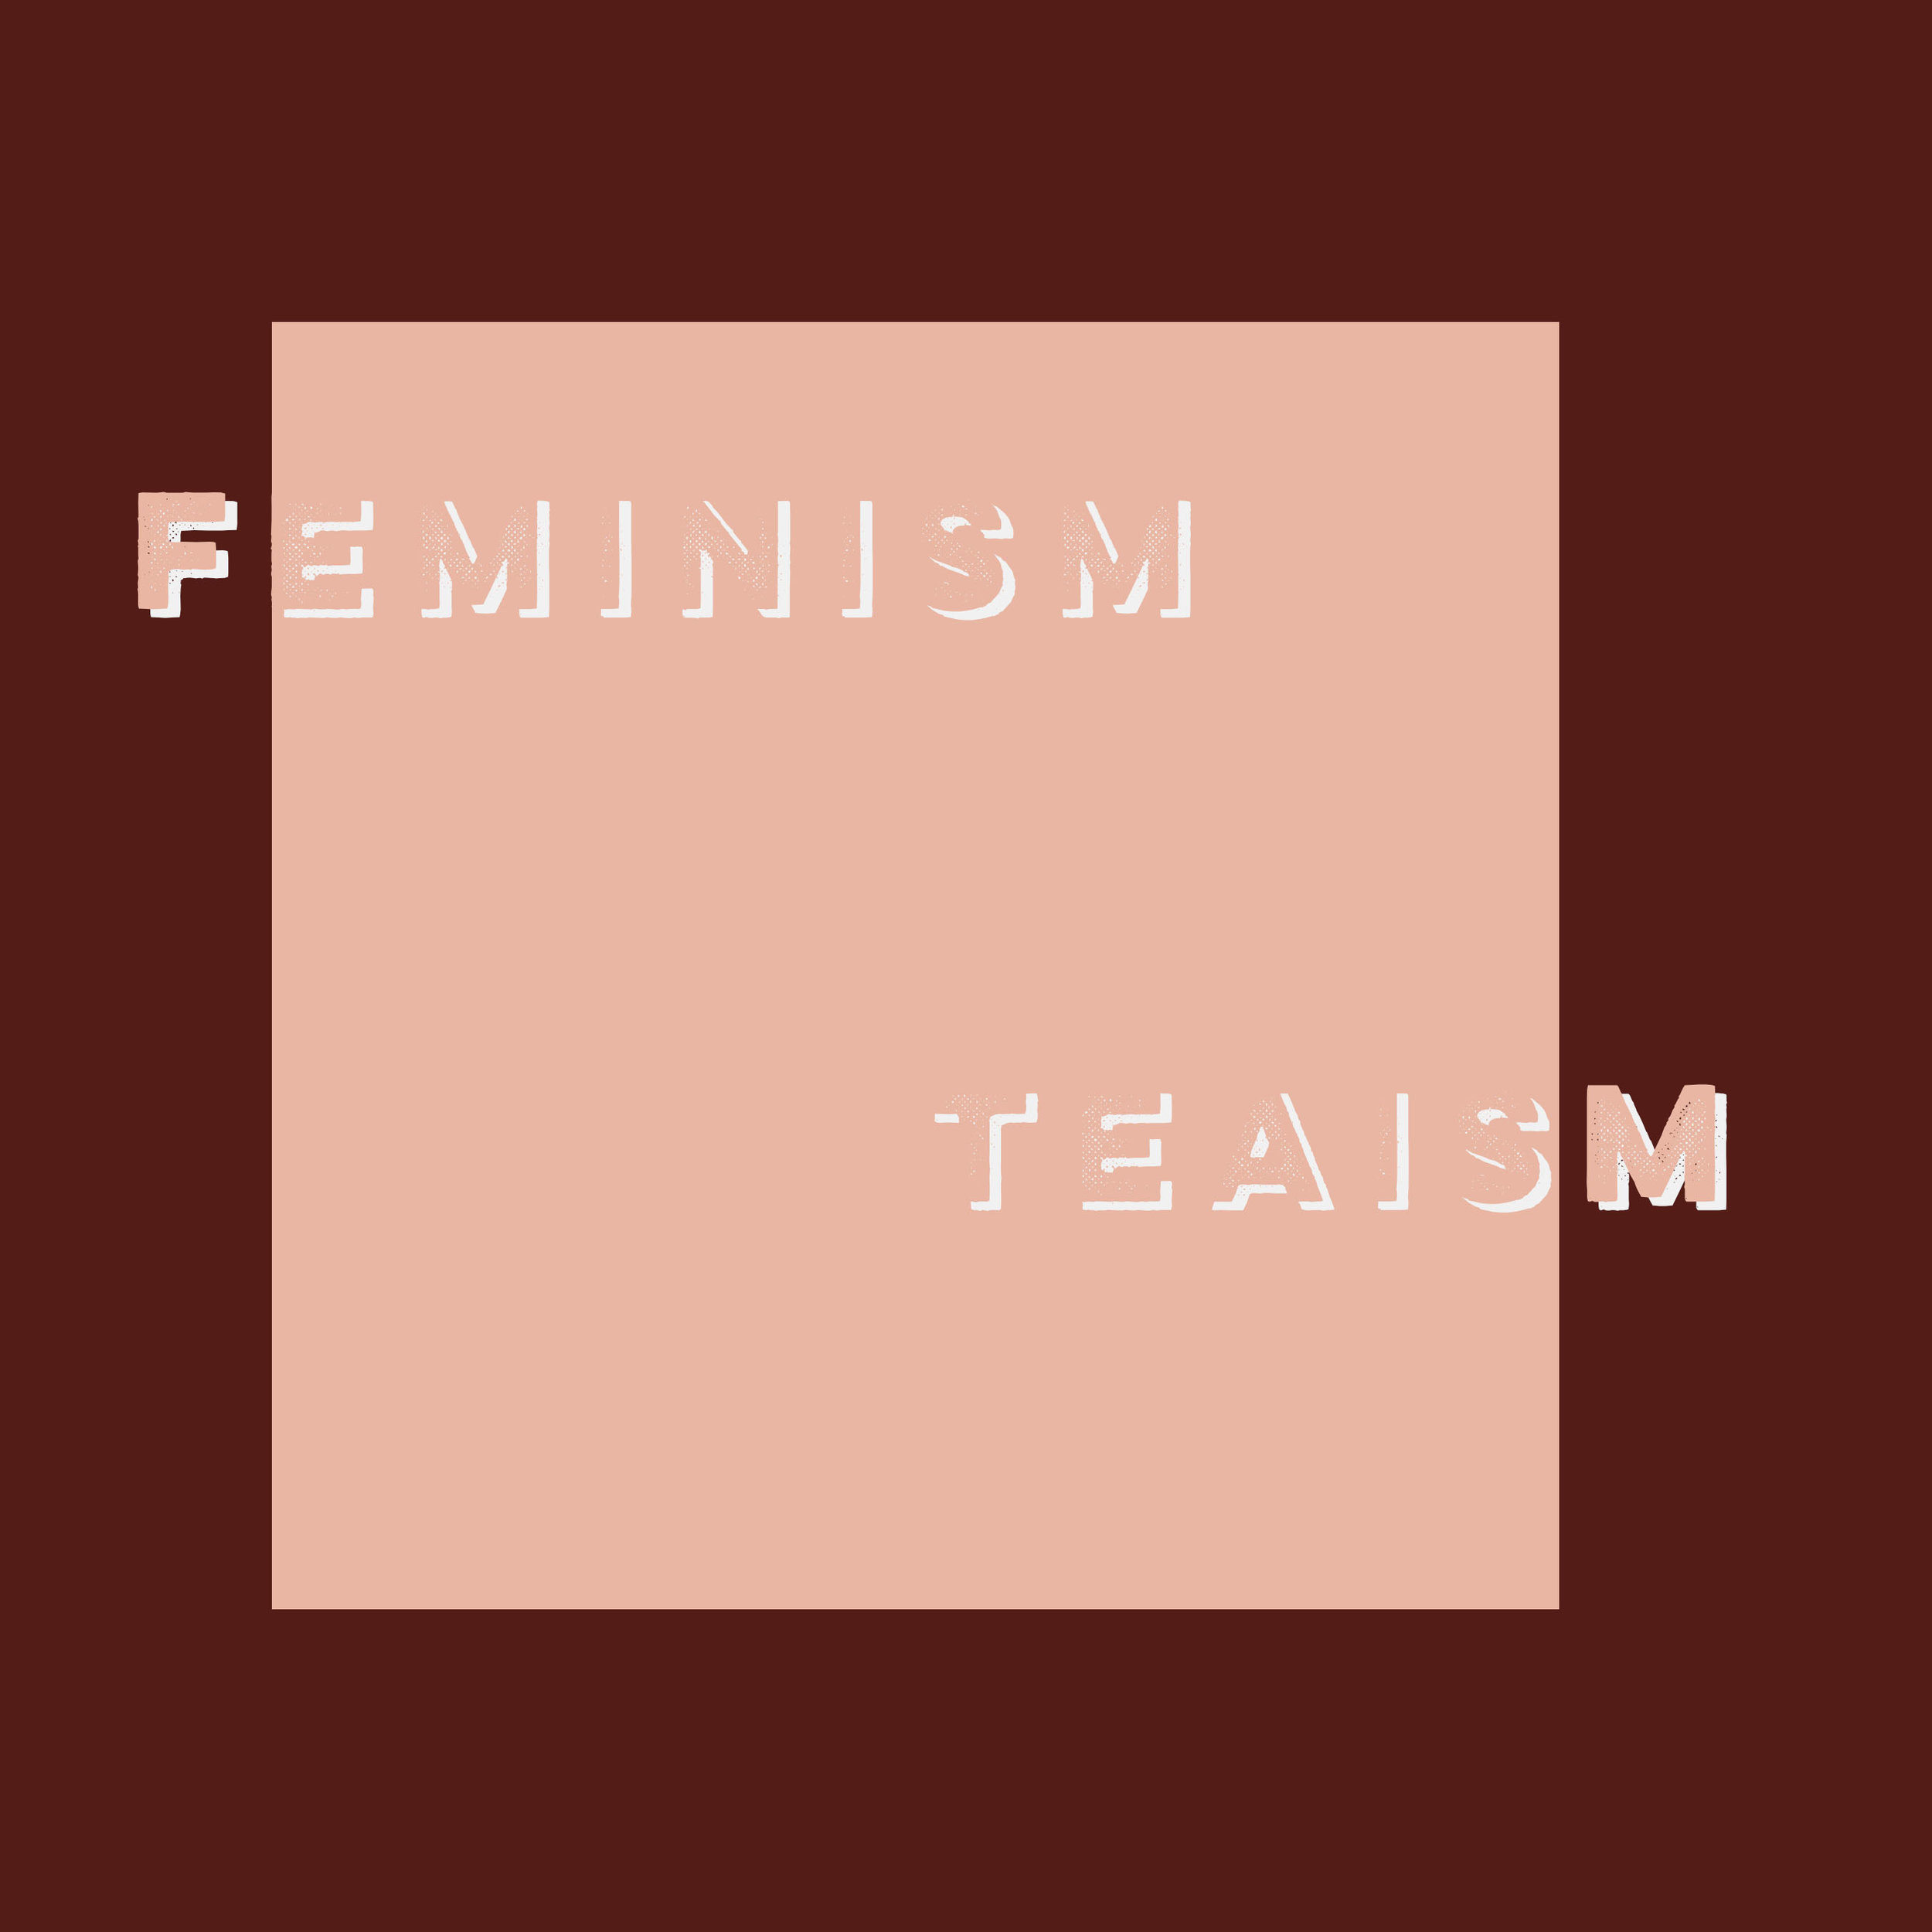 feminism-teaism